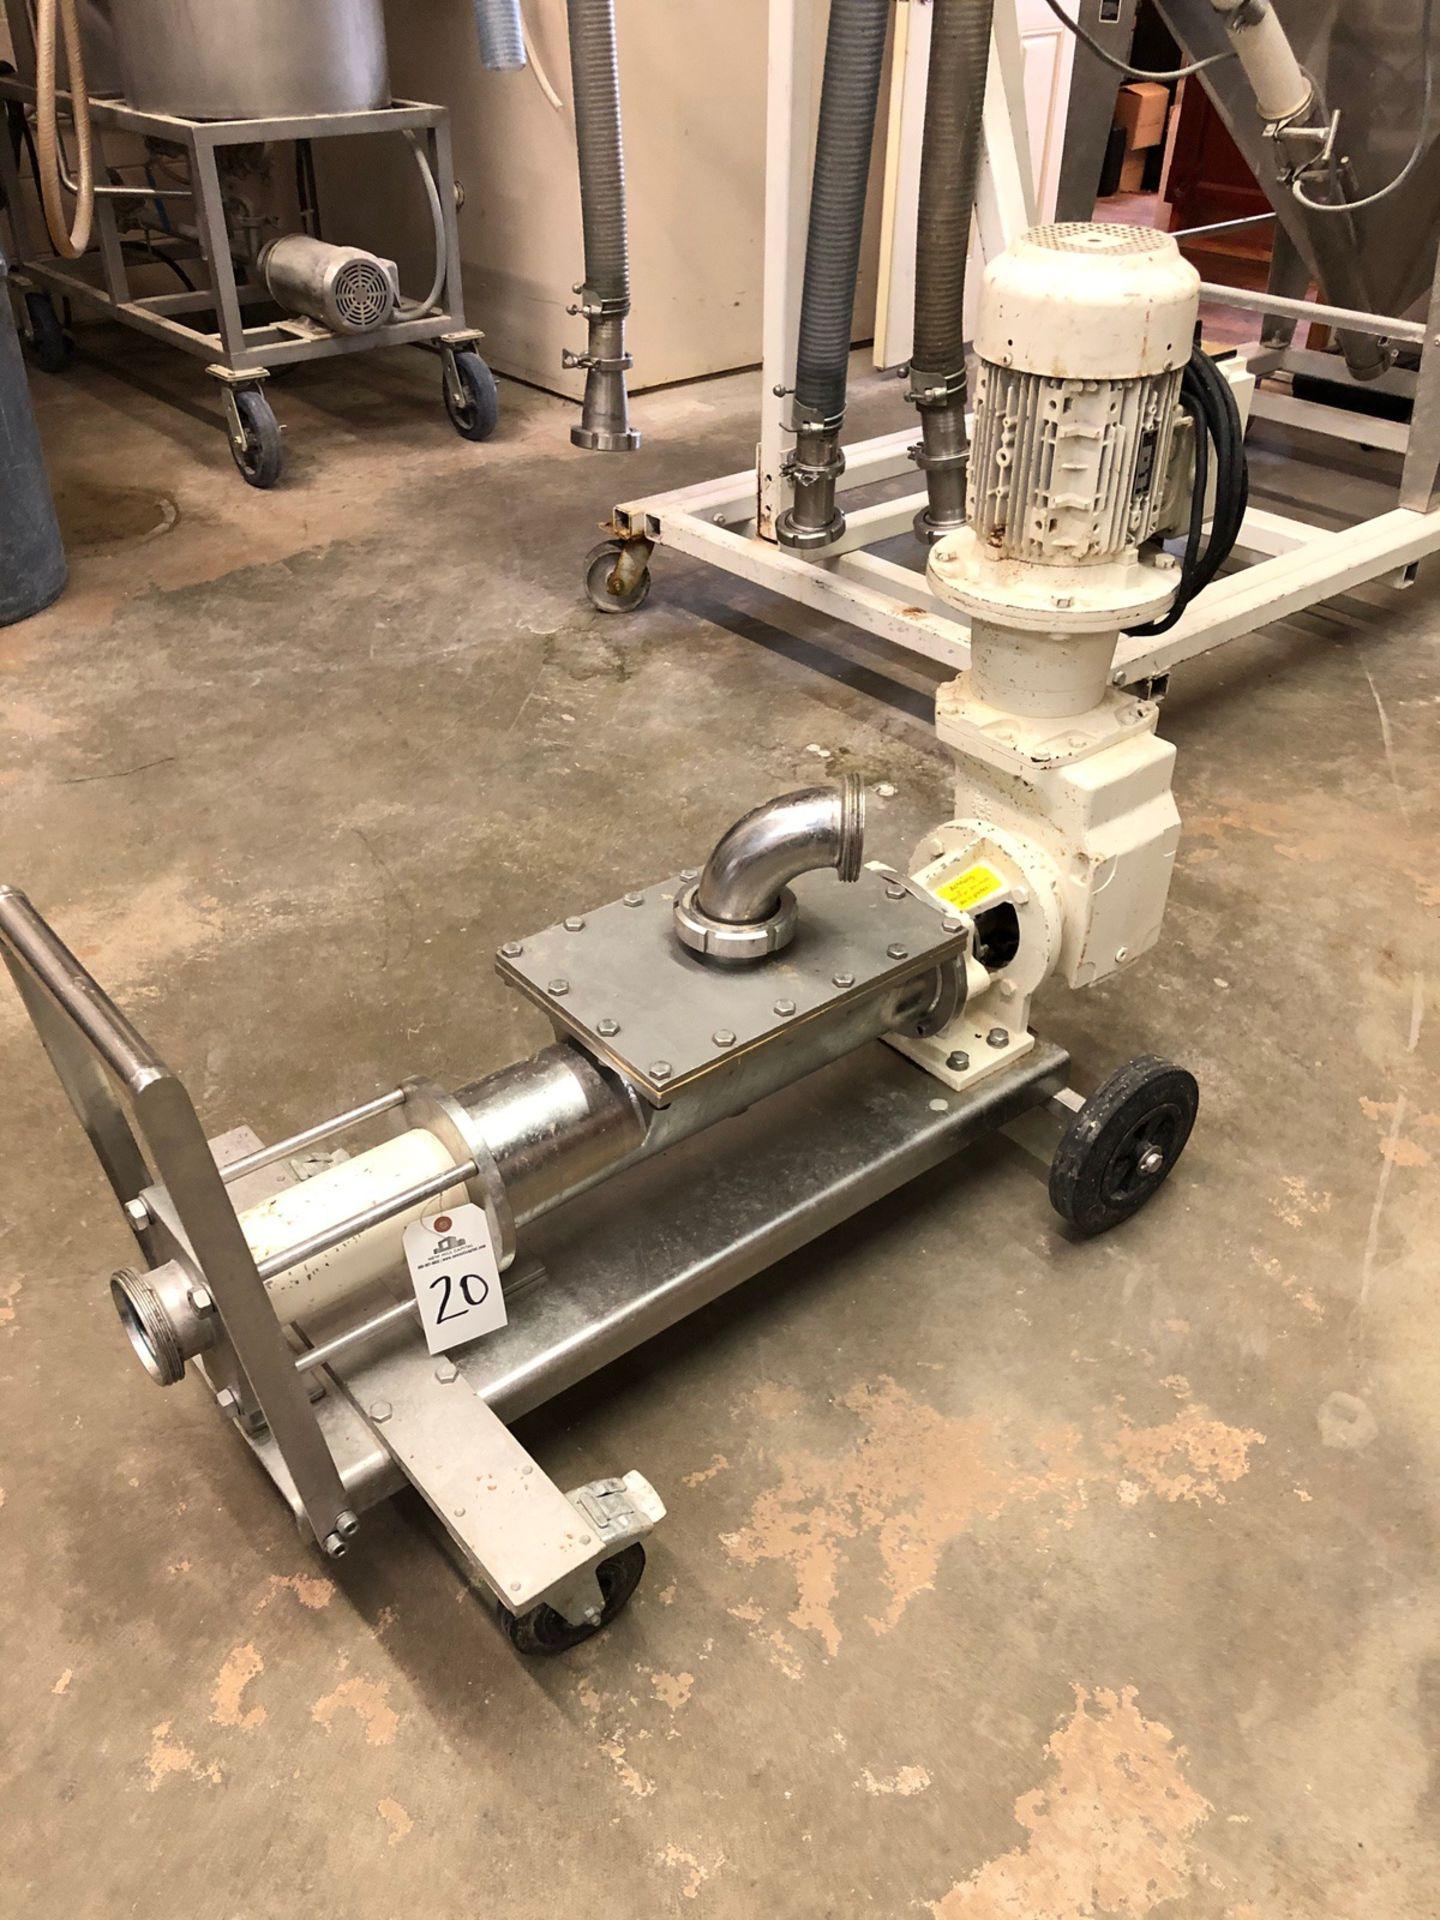 Lot 20 - Mash Screw Displacement Pump, 3KW, 330/400V @ 60Hz | Sub to Bulk | Rig Fee: $75